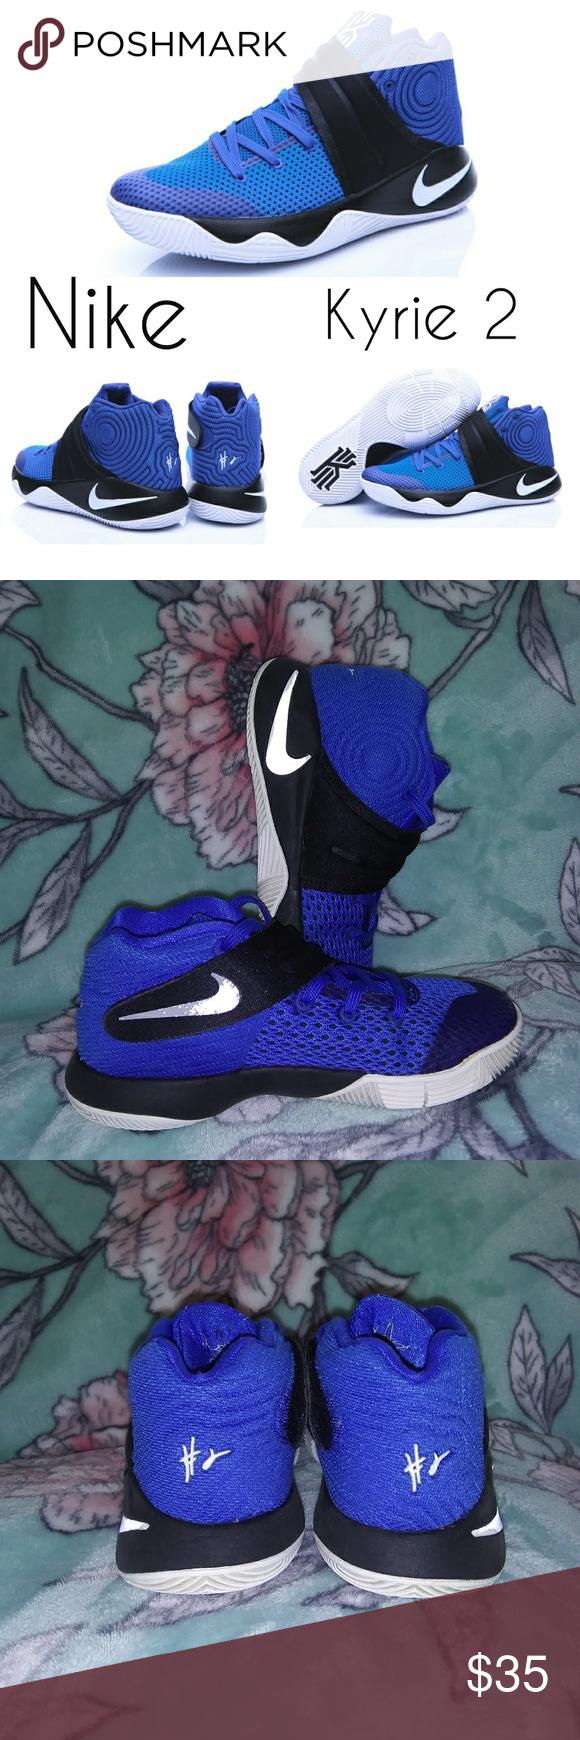 Nike Kyrie 2 Boys Sneakers Blue/white